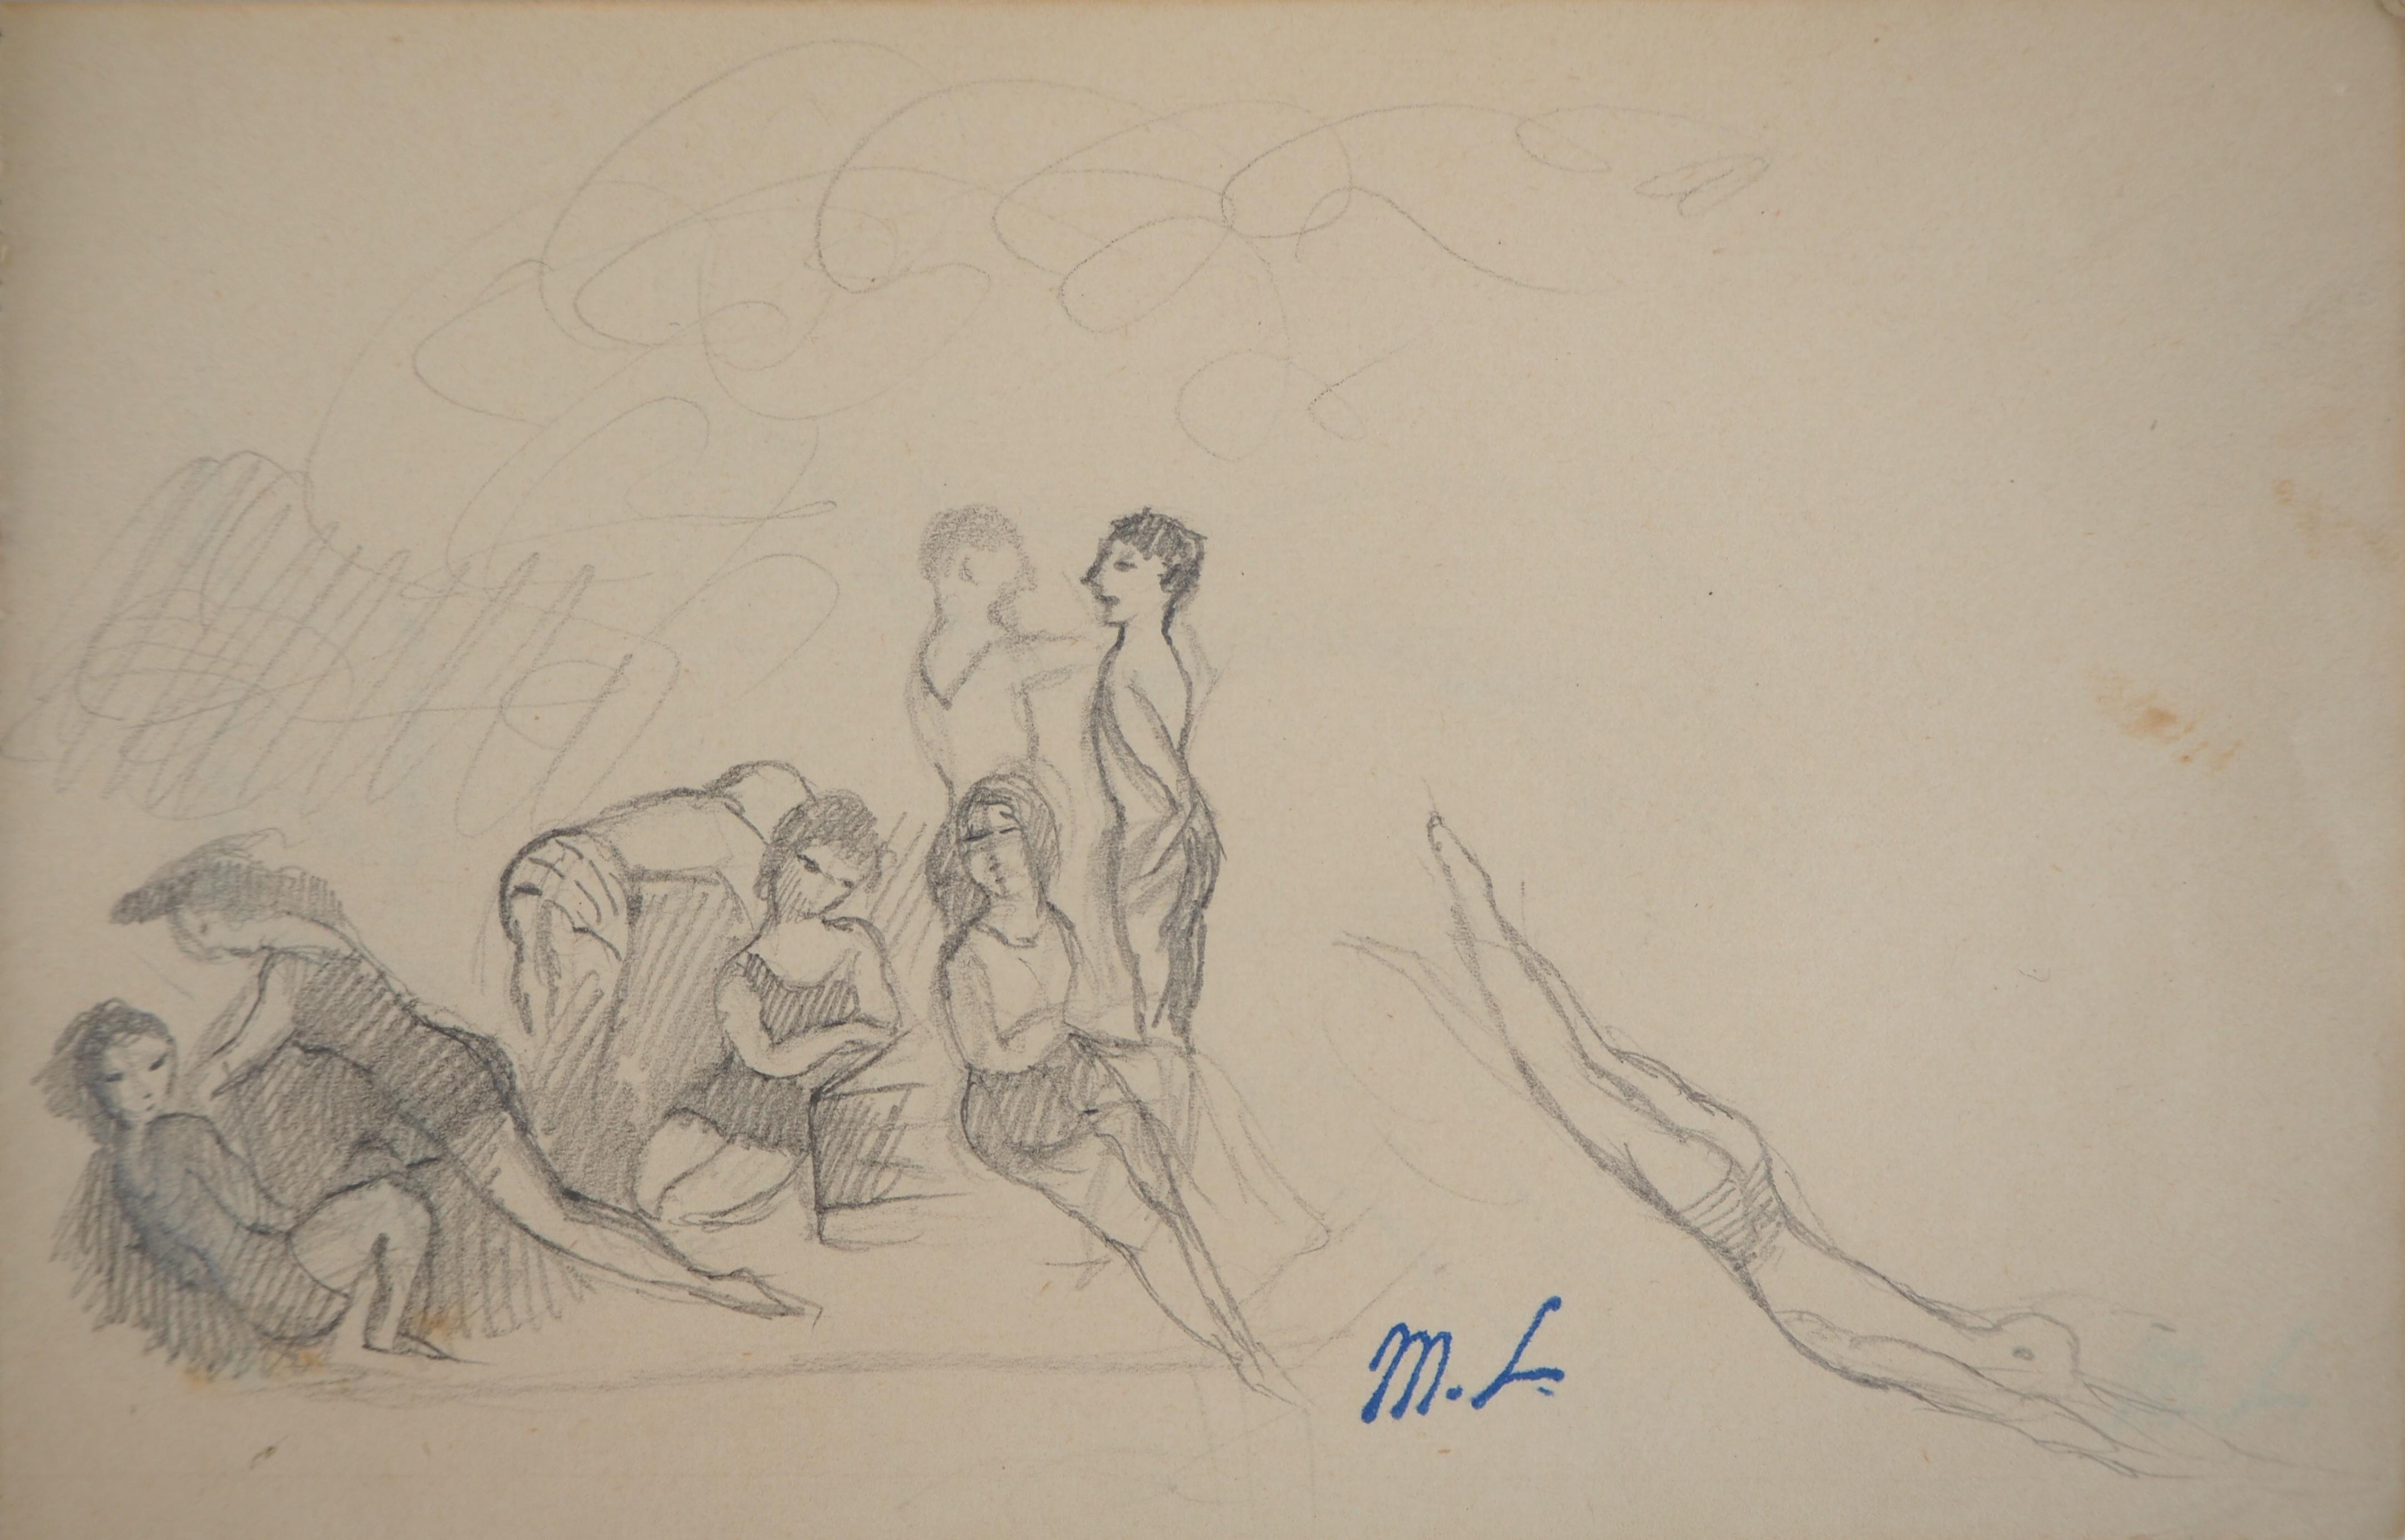 Summer : Girls and Boys at the Beach - Original pencil drawing